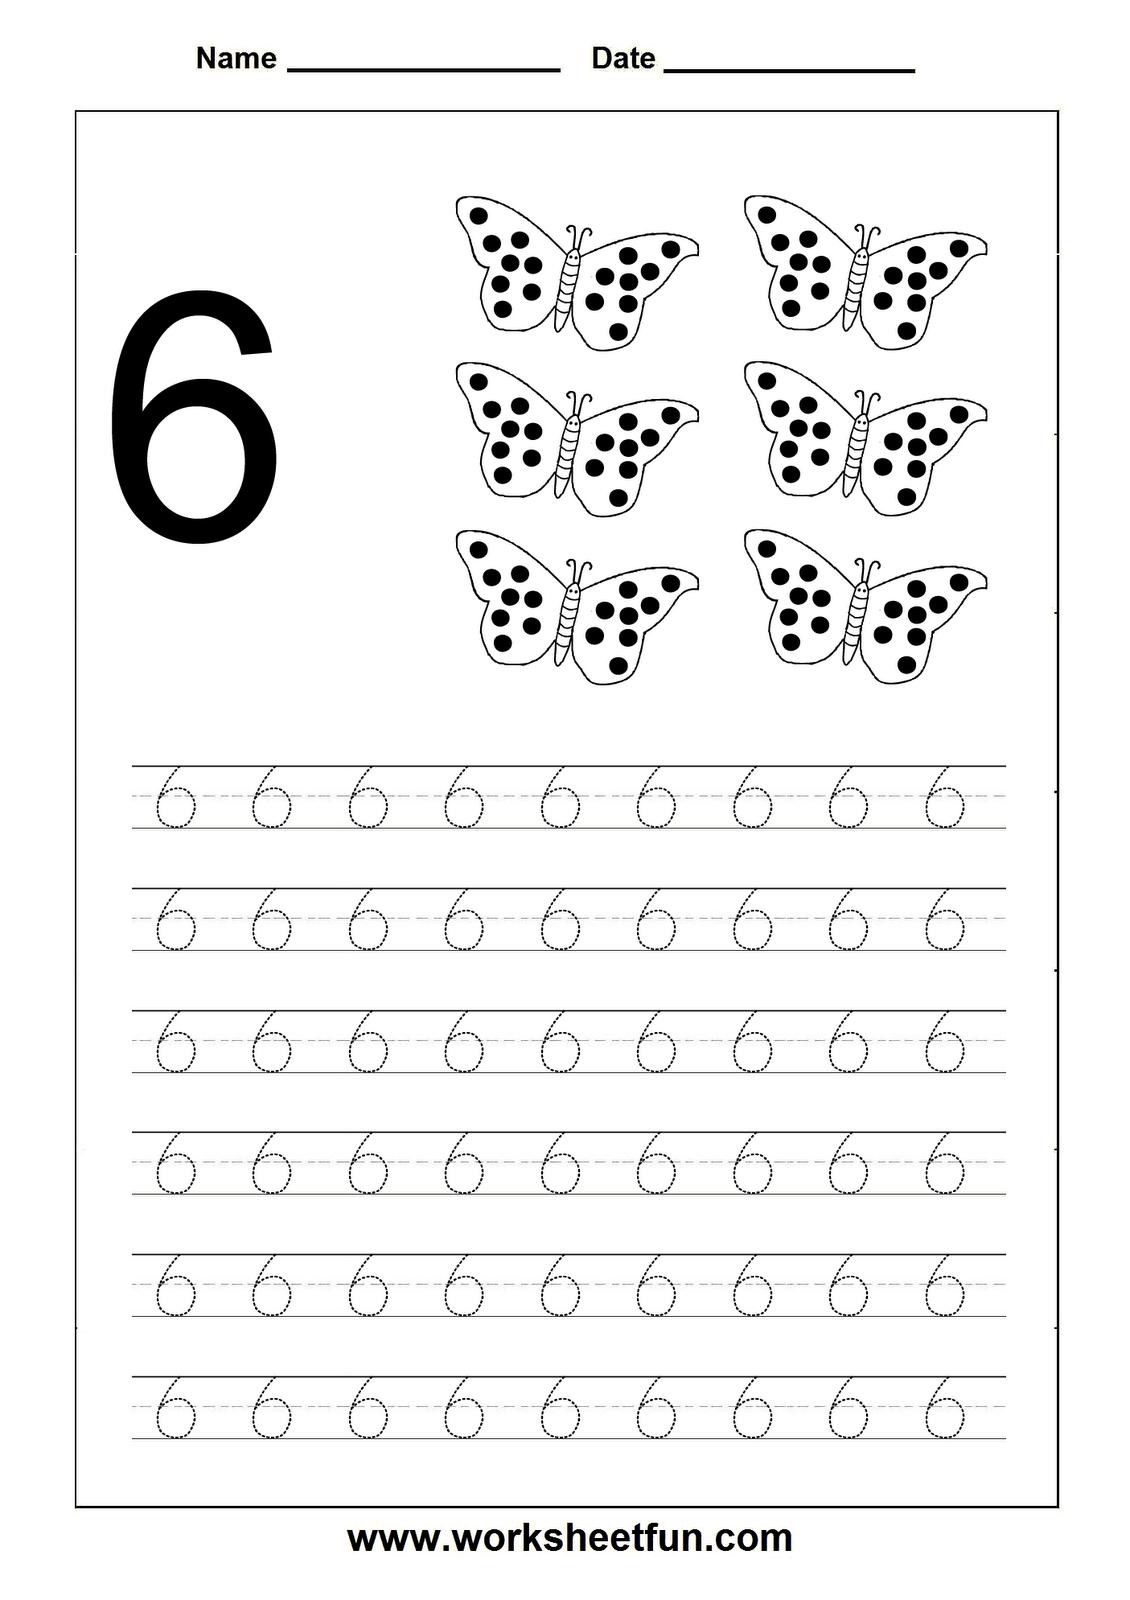 Number Tracing Worksheet 6 Sayilar Pinterest